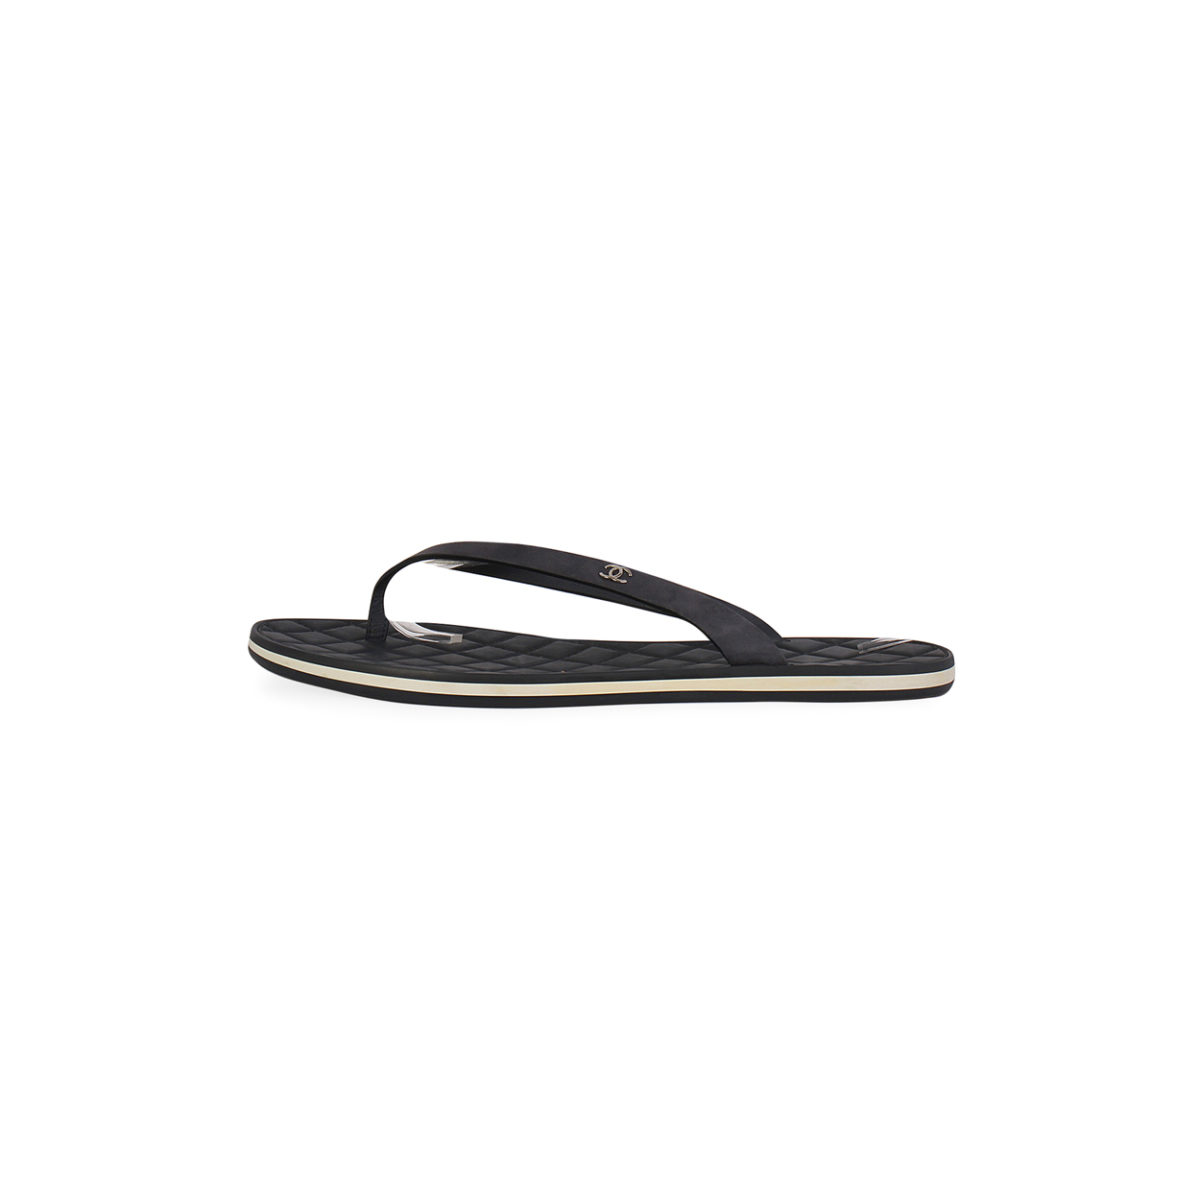 467dd04df872e1 CHANEL Calfskin Quilted Thong Flip Flop Sandals Blue - S  36.5 (3.5 ...